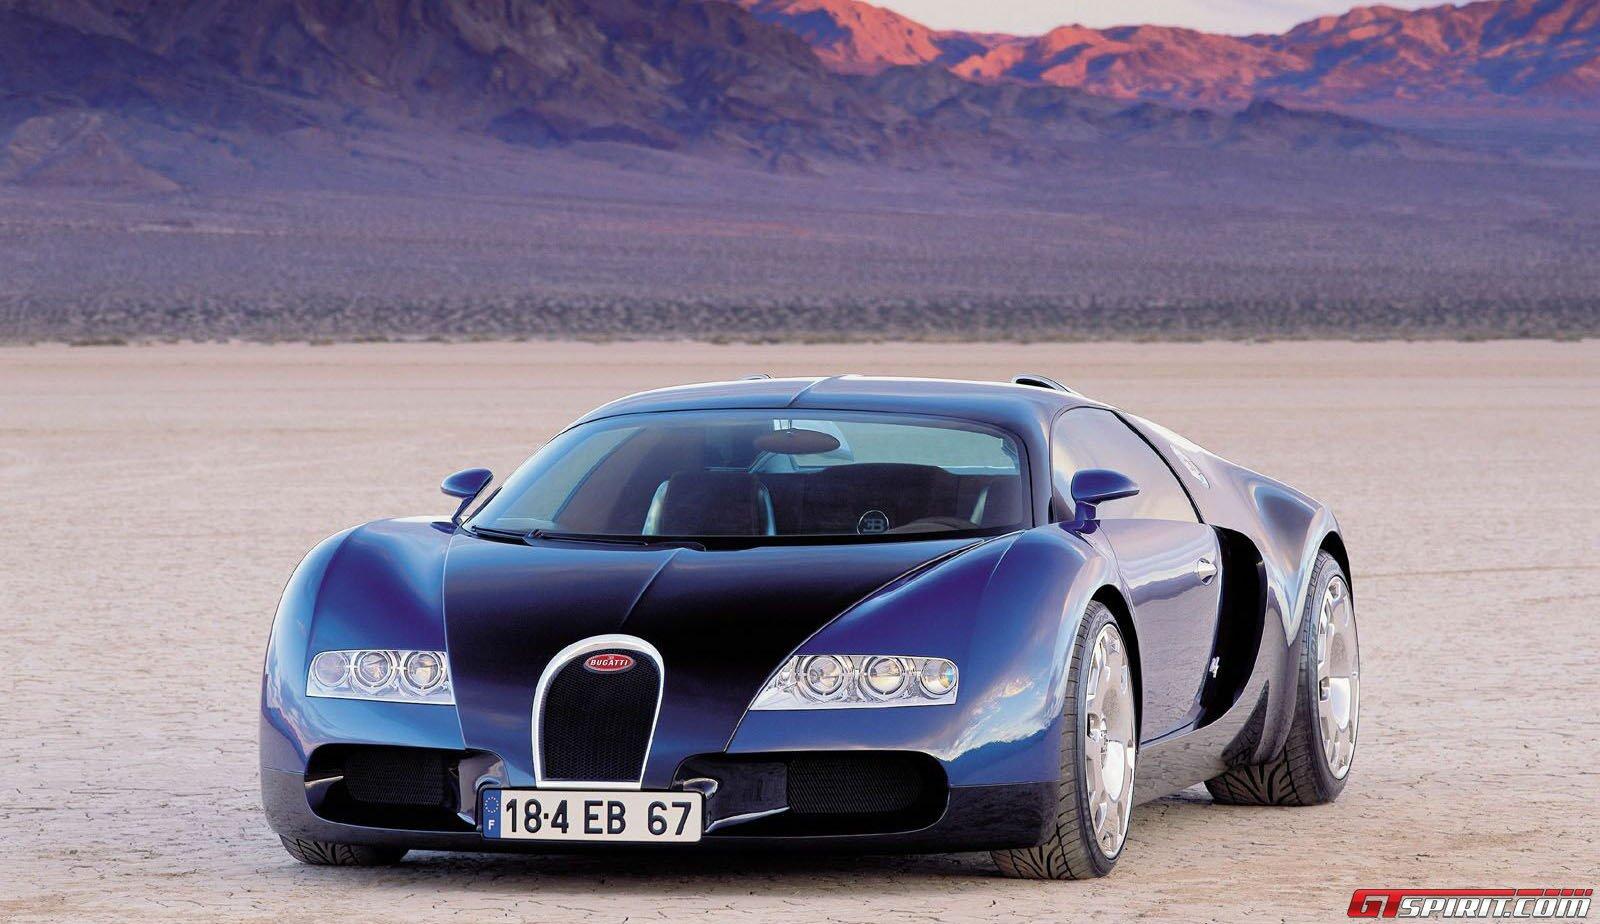 Bugatti bugatti how many made : Bugatti Veyron Grand Sport Vitesse World Record Car Review - GTspirit